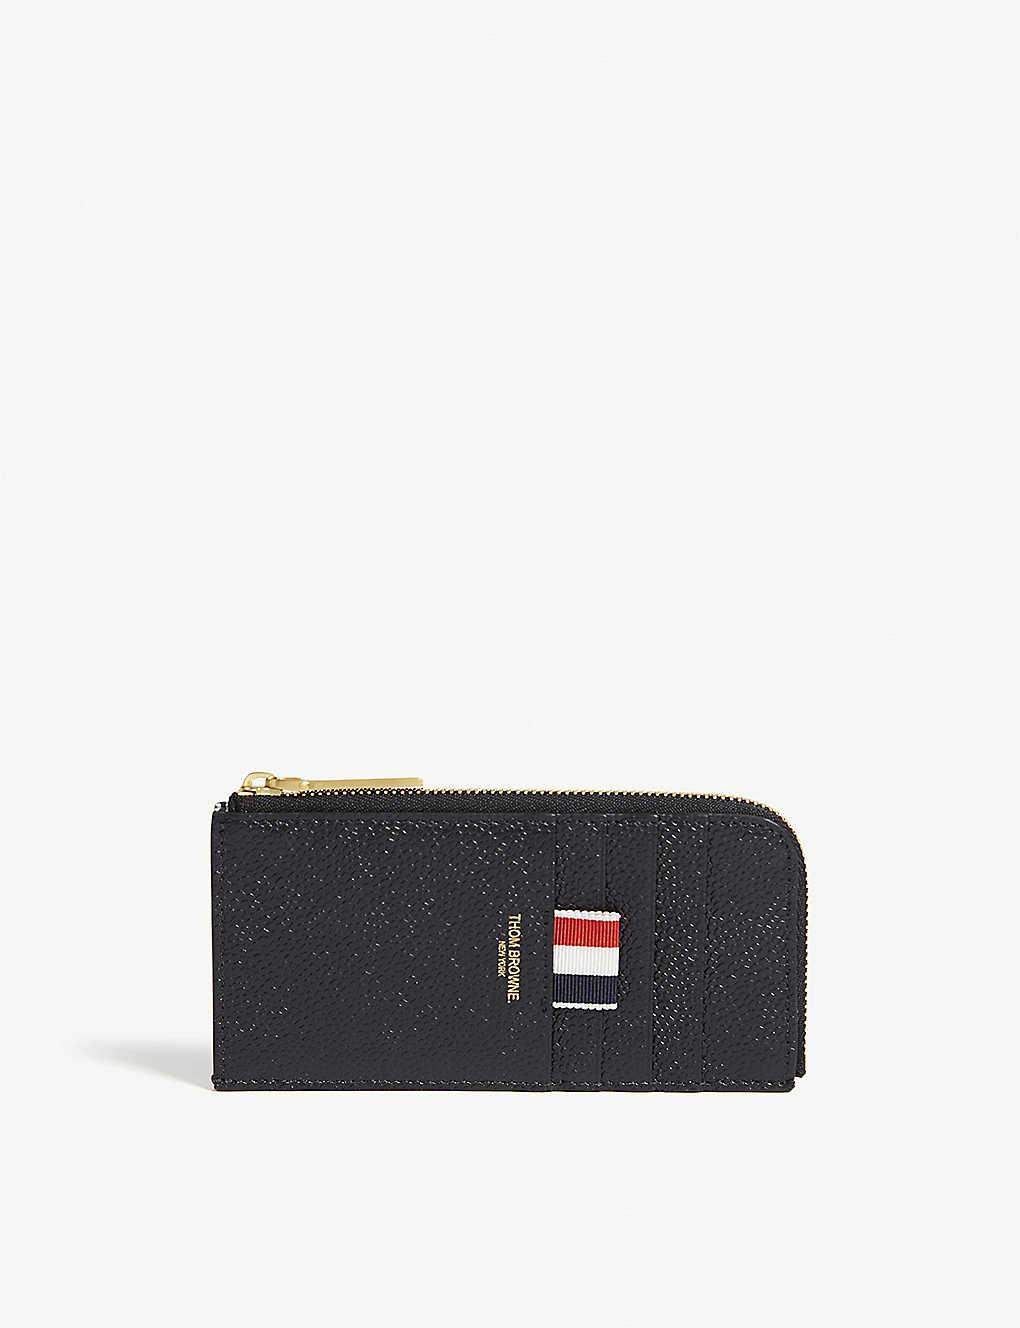 8a661a31f33f THOM BROWNE - Pebbled leather half-zip card case | Selfridges.com